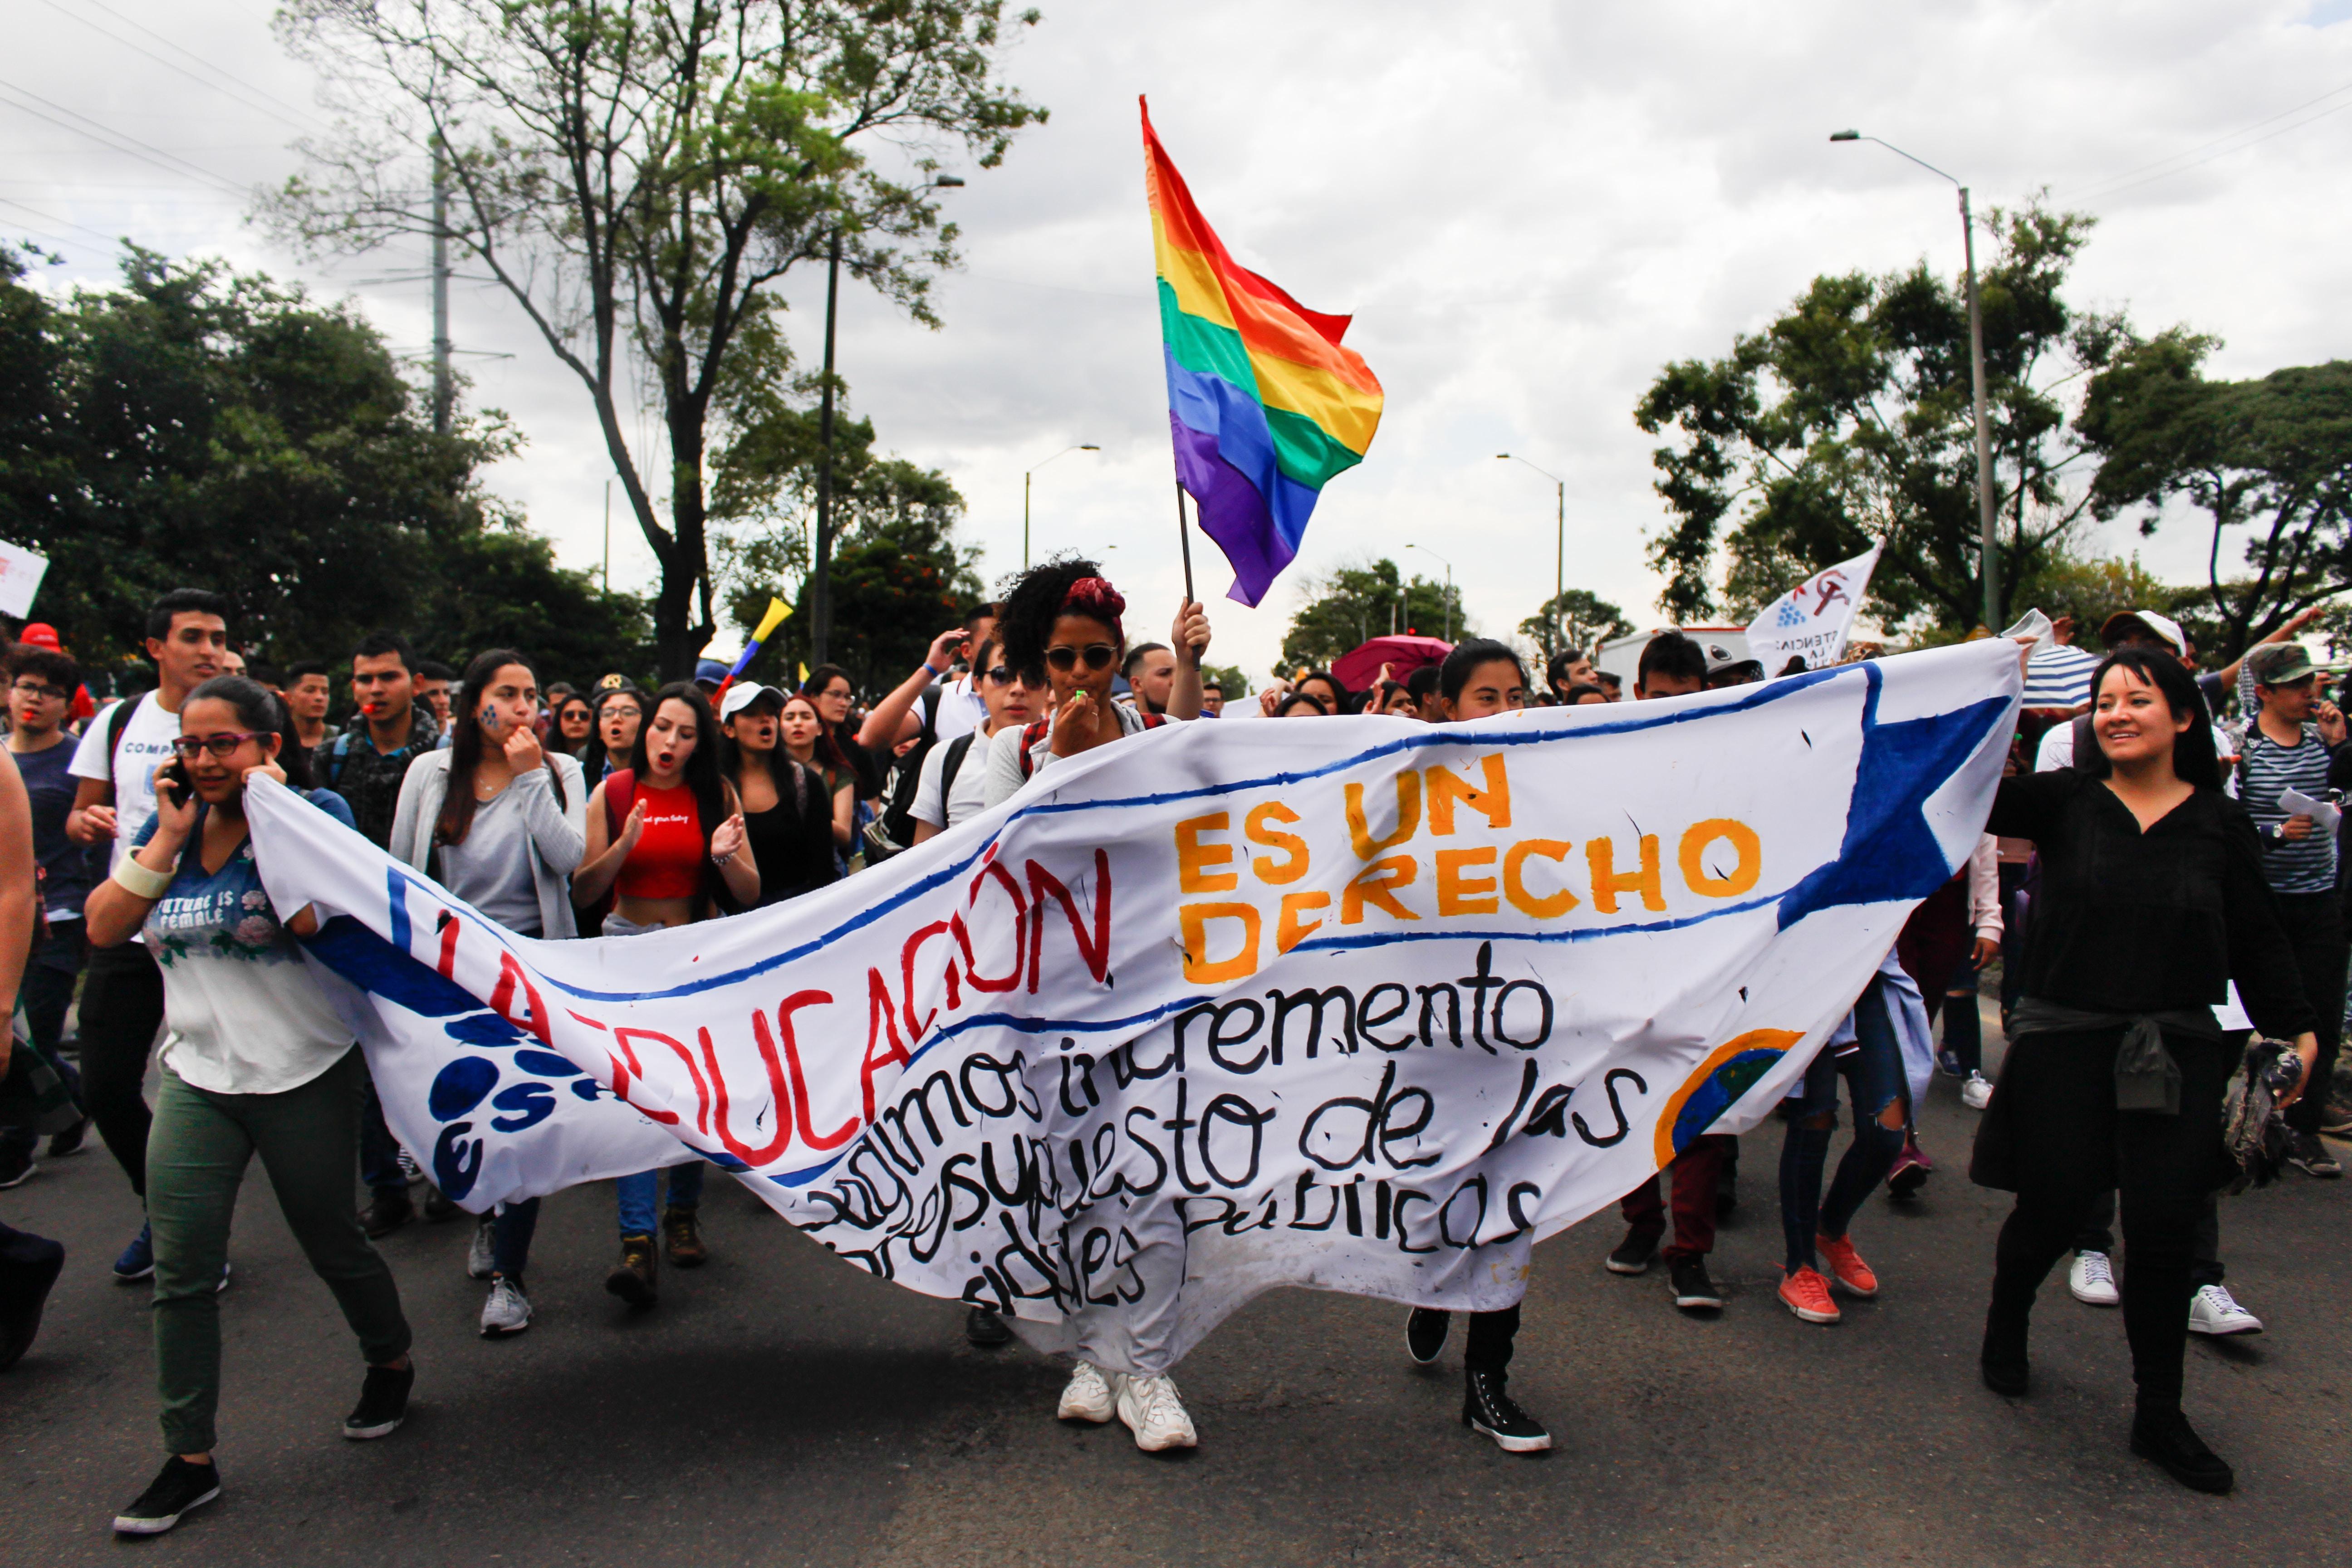 group of people walking on street holding Rainbow flag